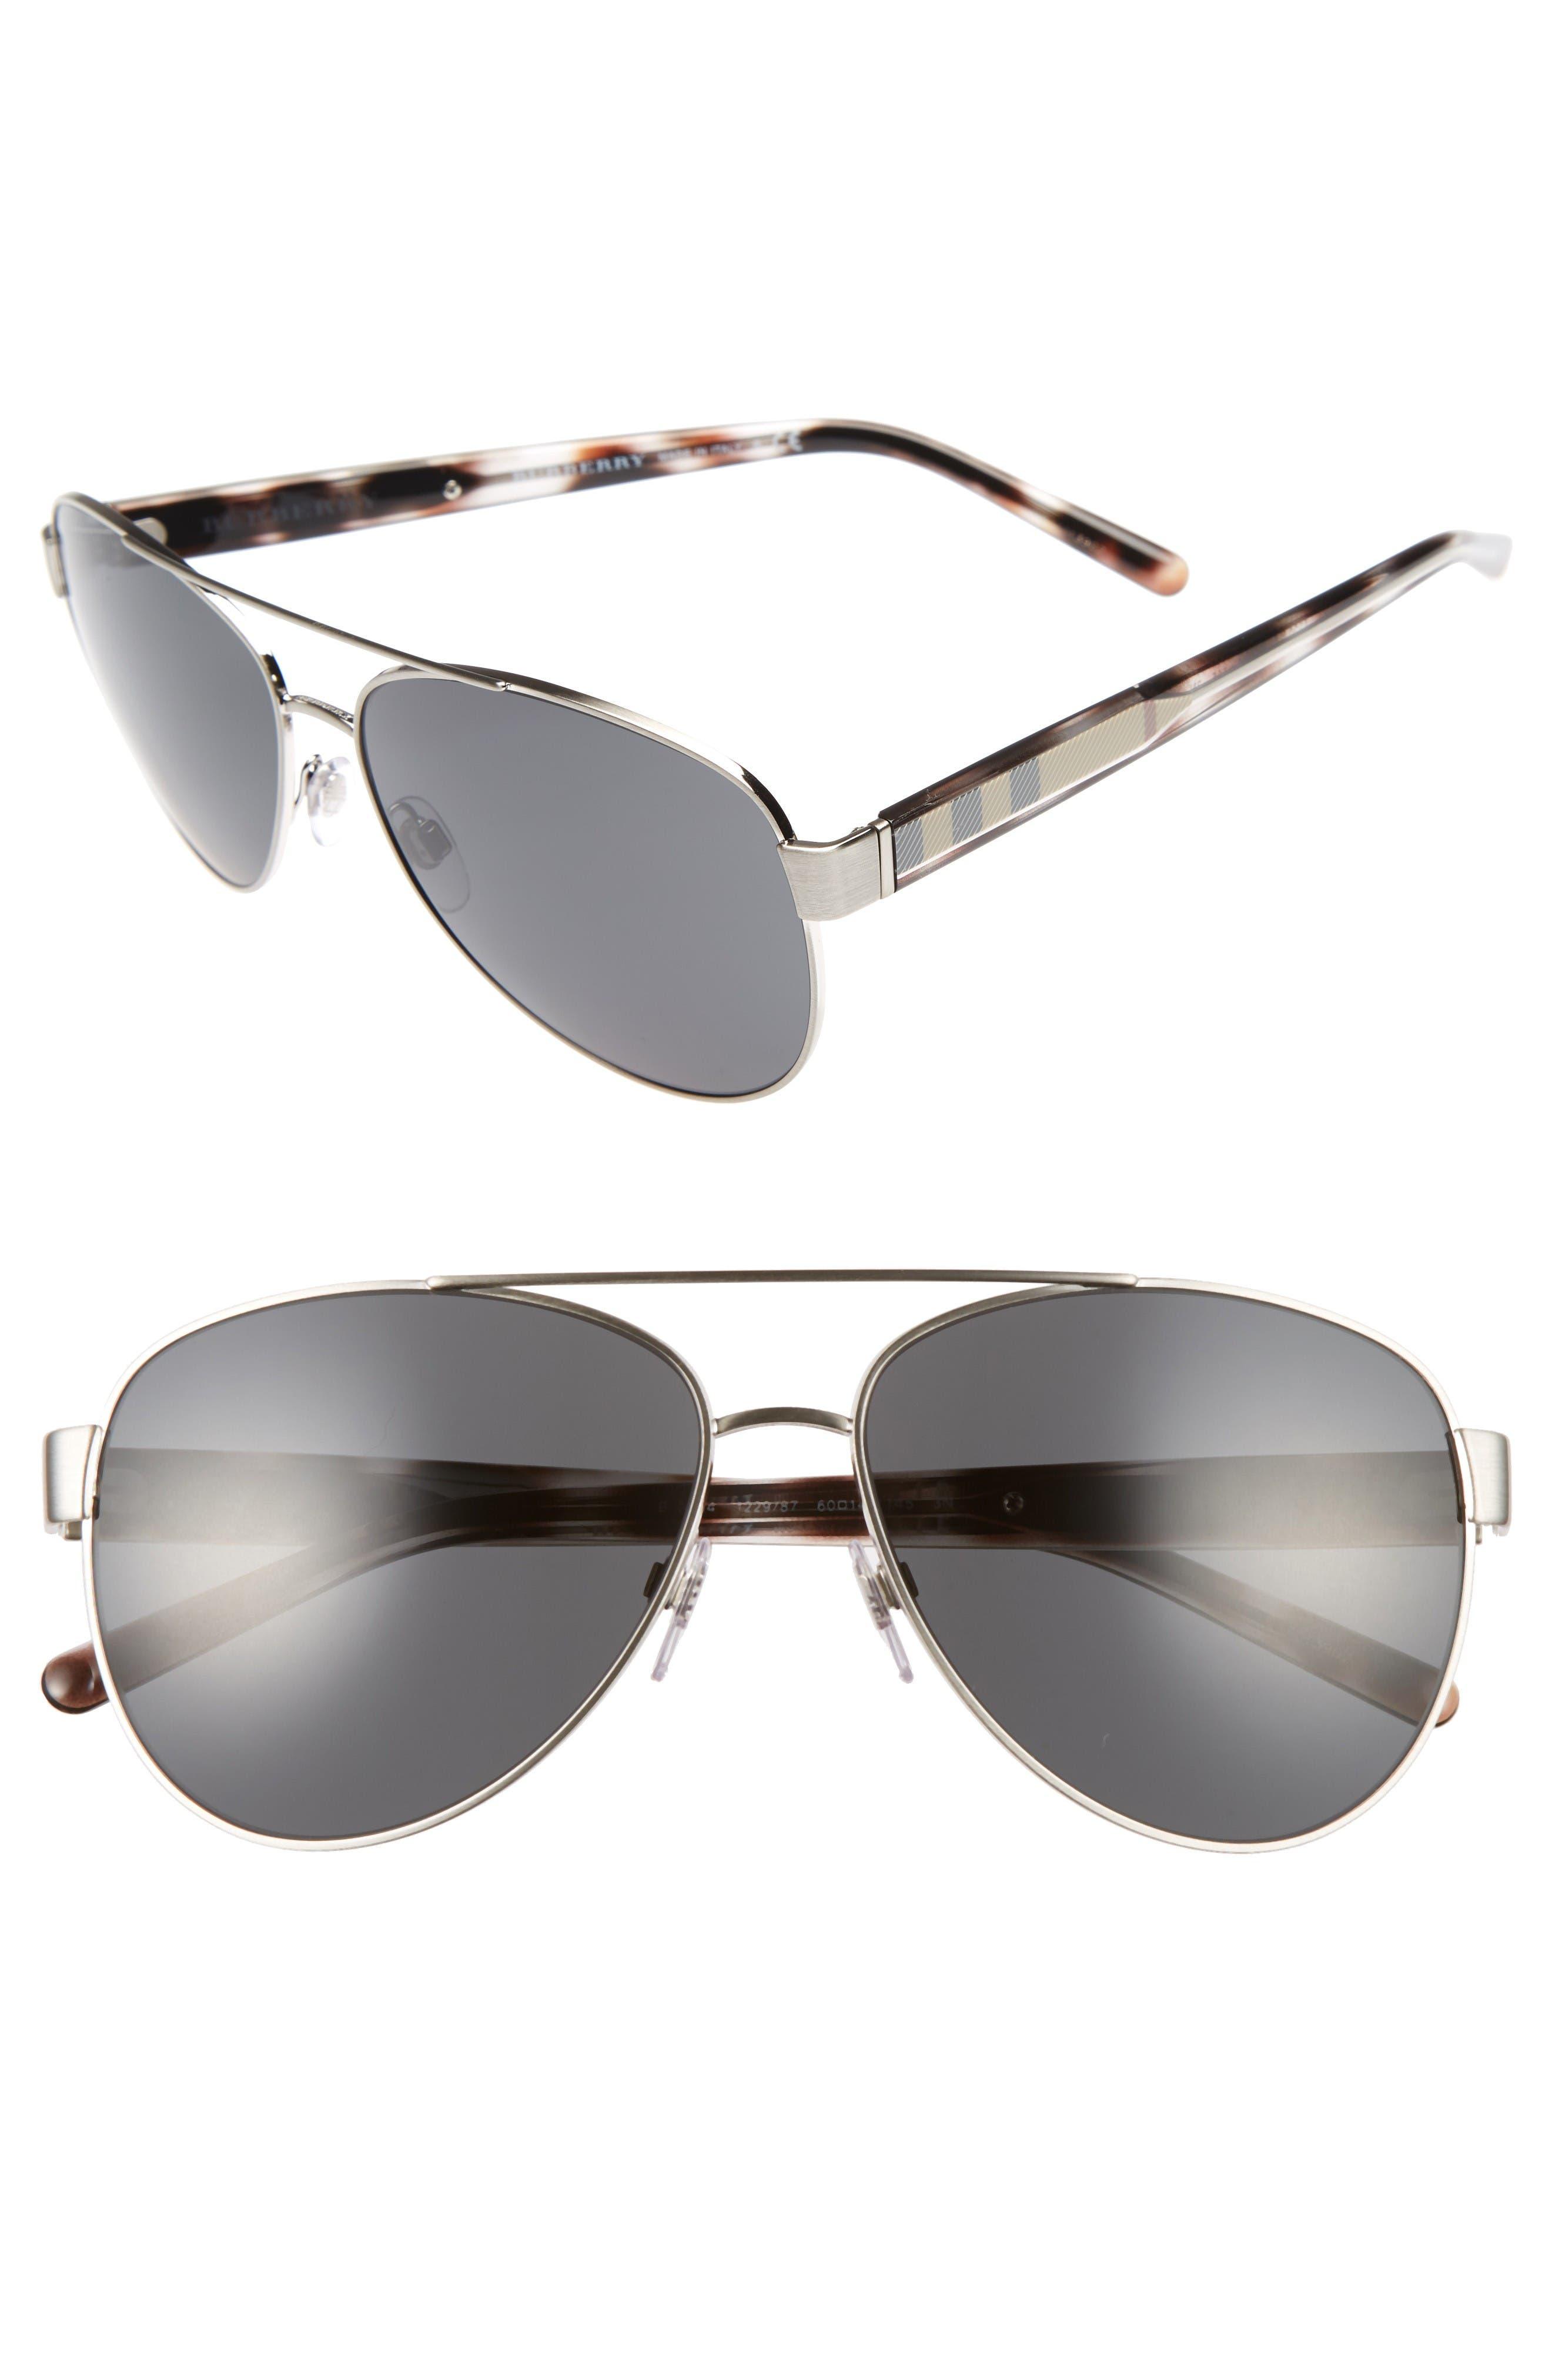 Burberry 60mm Aviator Sunglasses